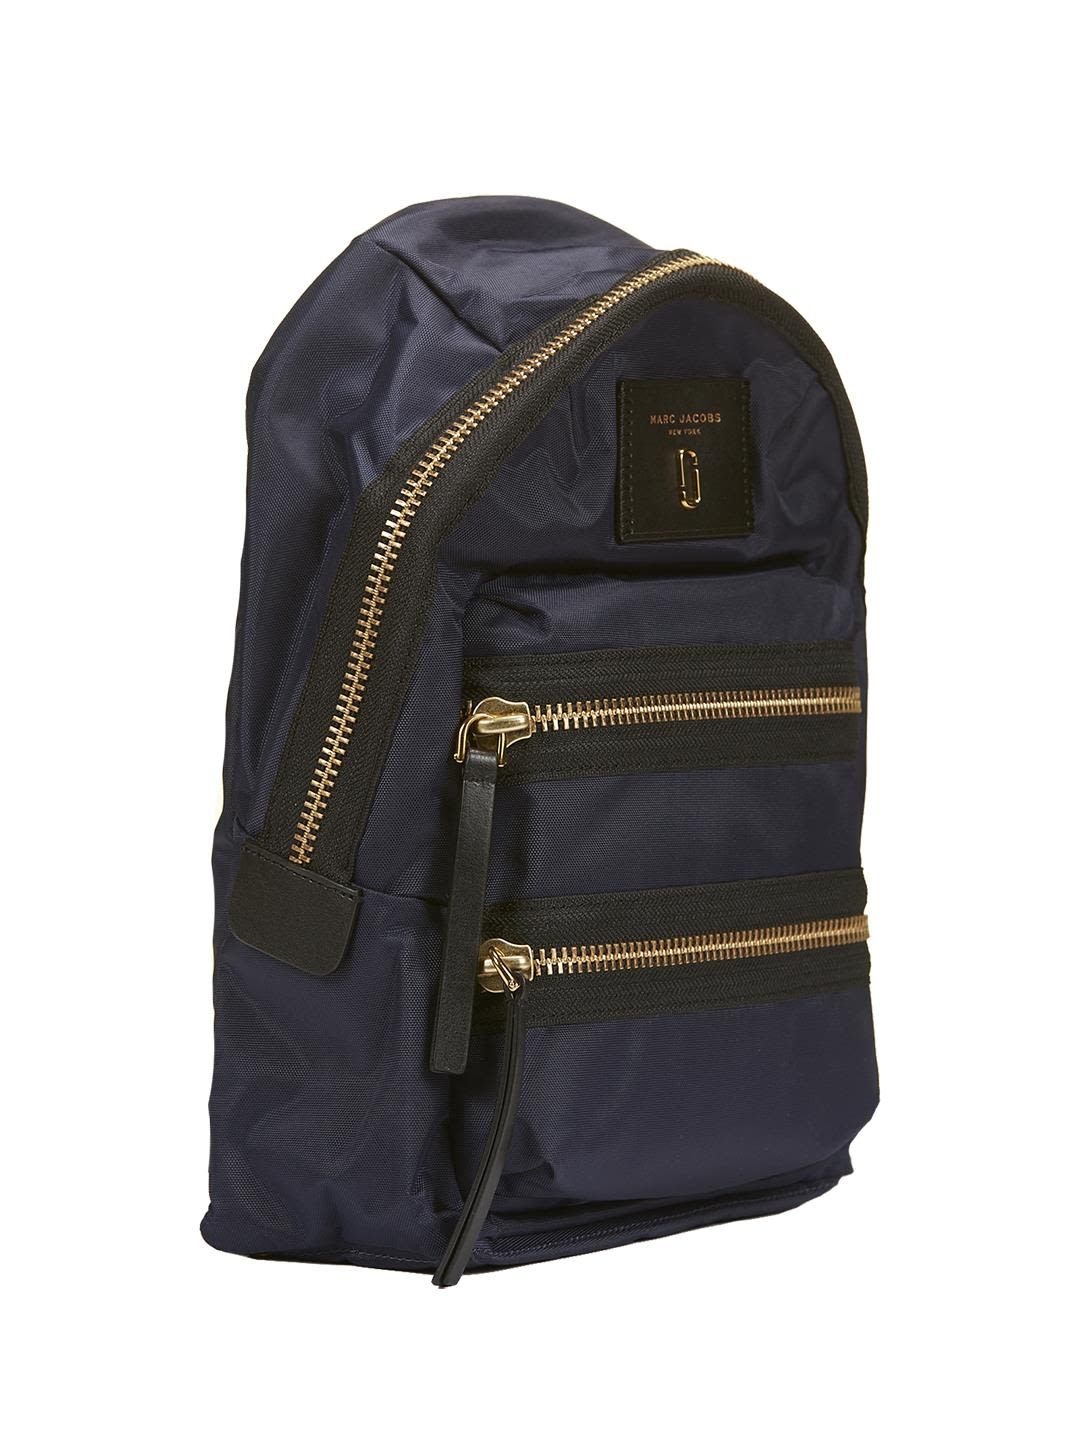 marc jacobs -  Biker Backpack